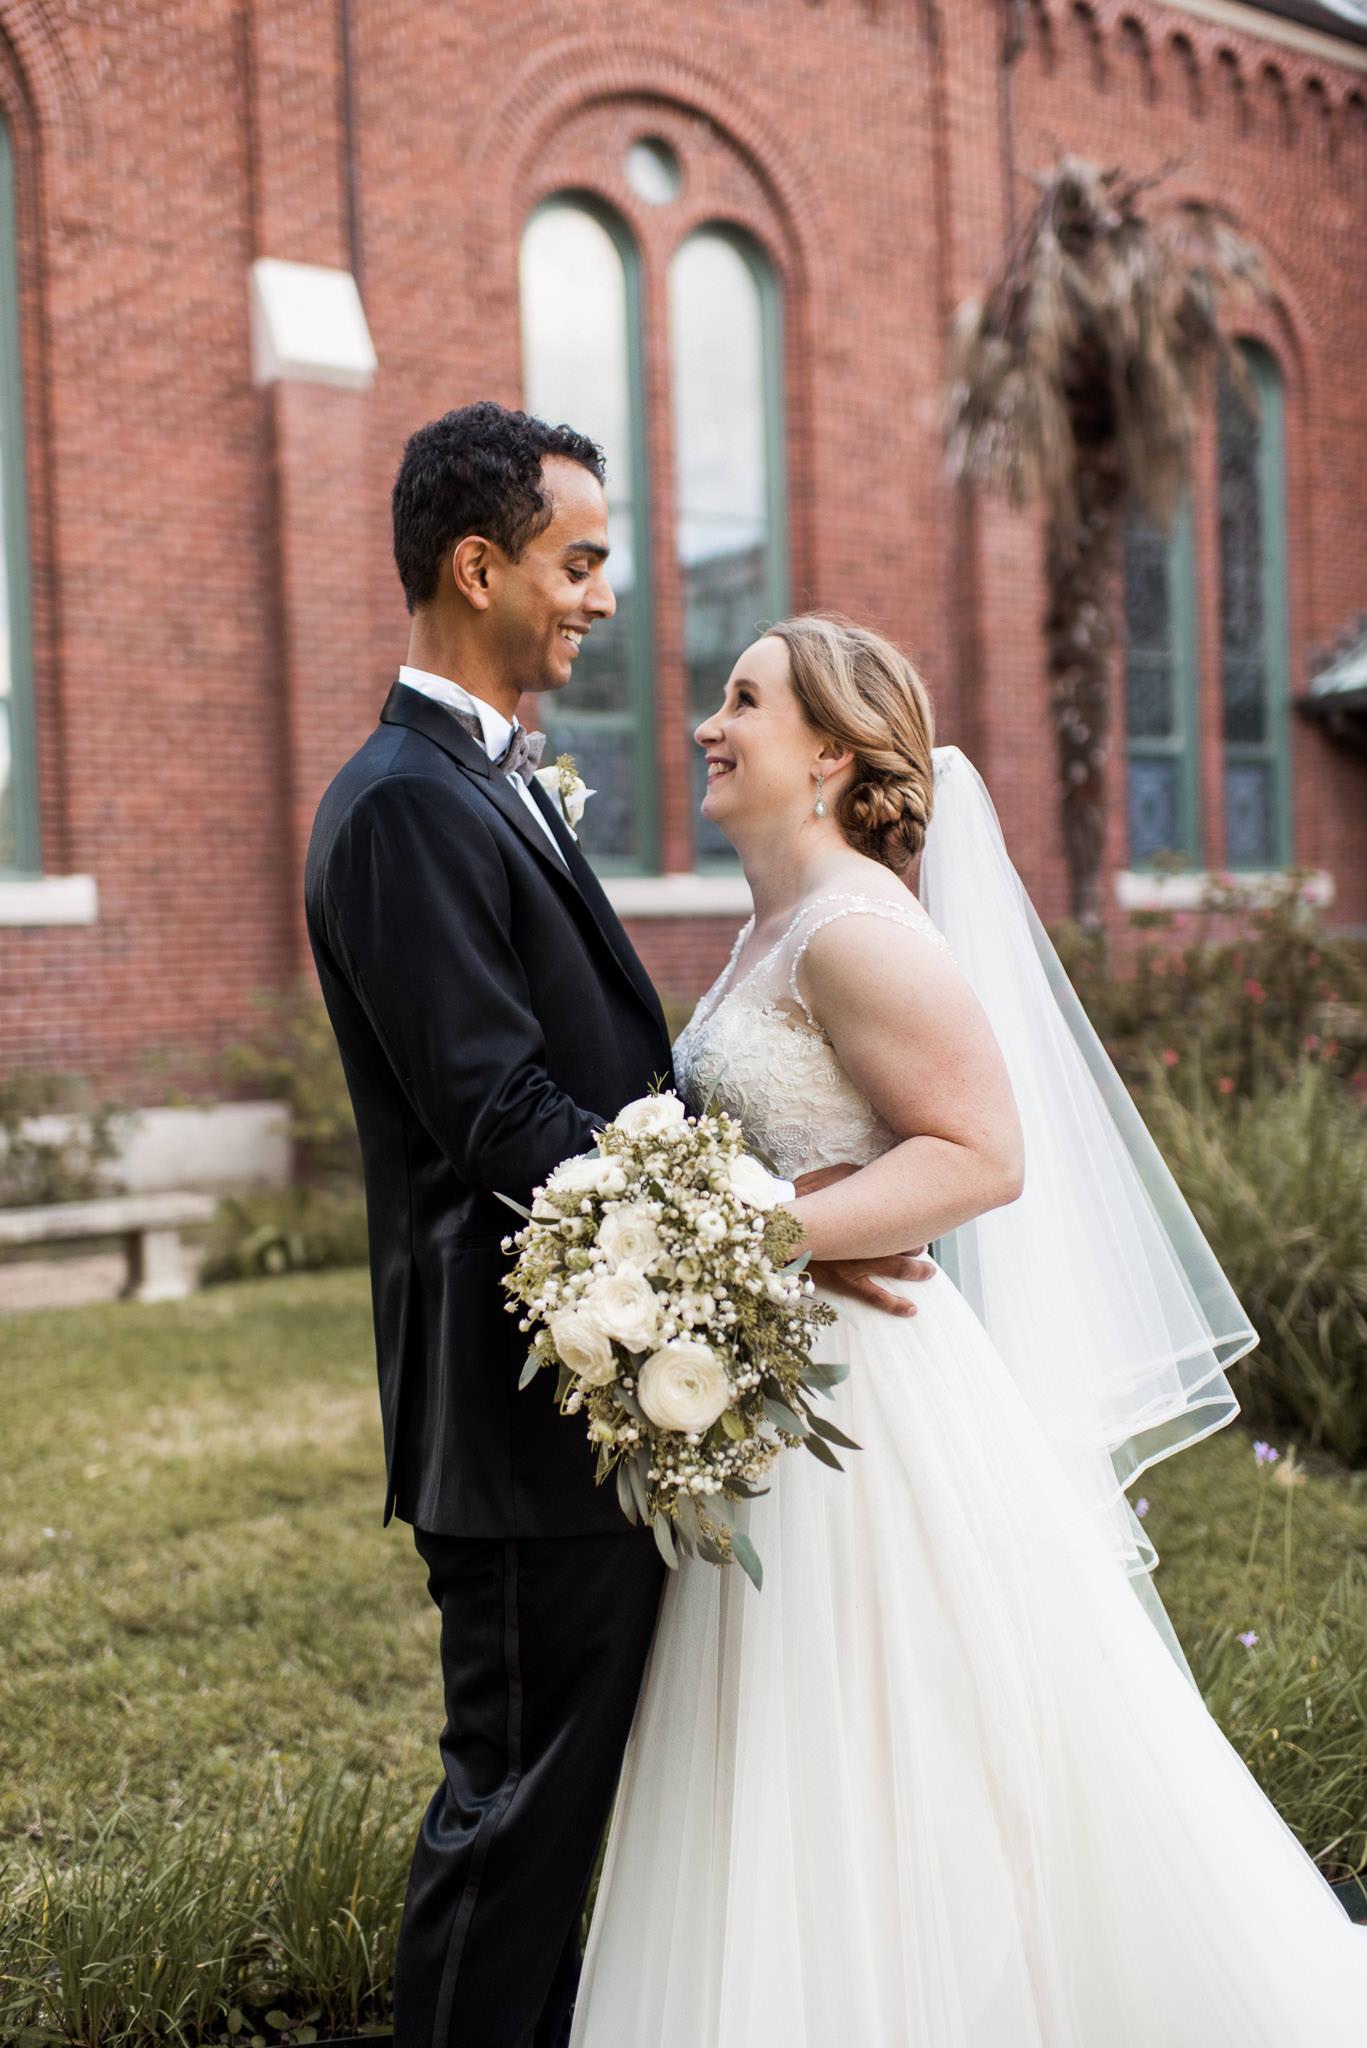 nicole-fellipe-wedding-sm-15.jpg